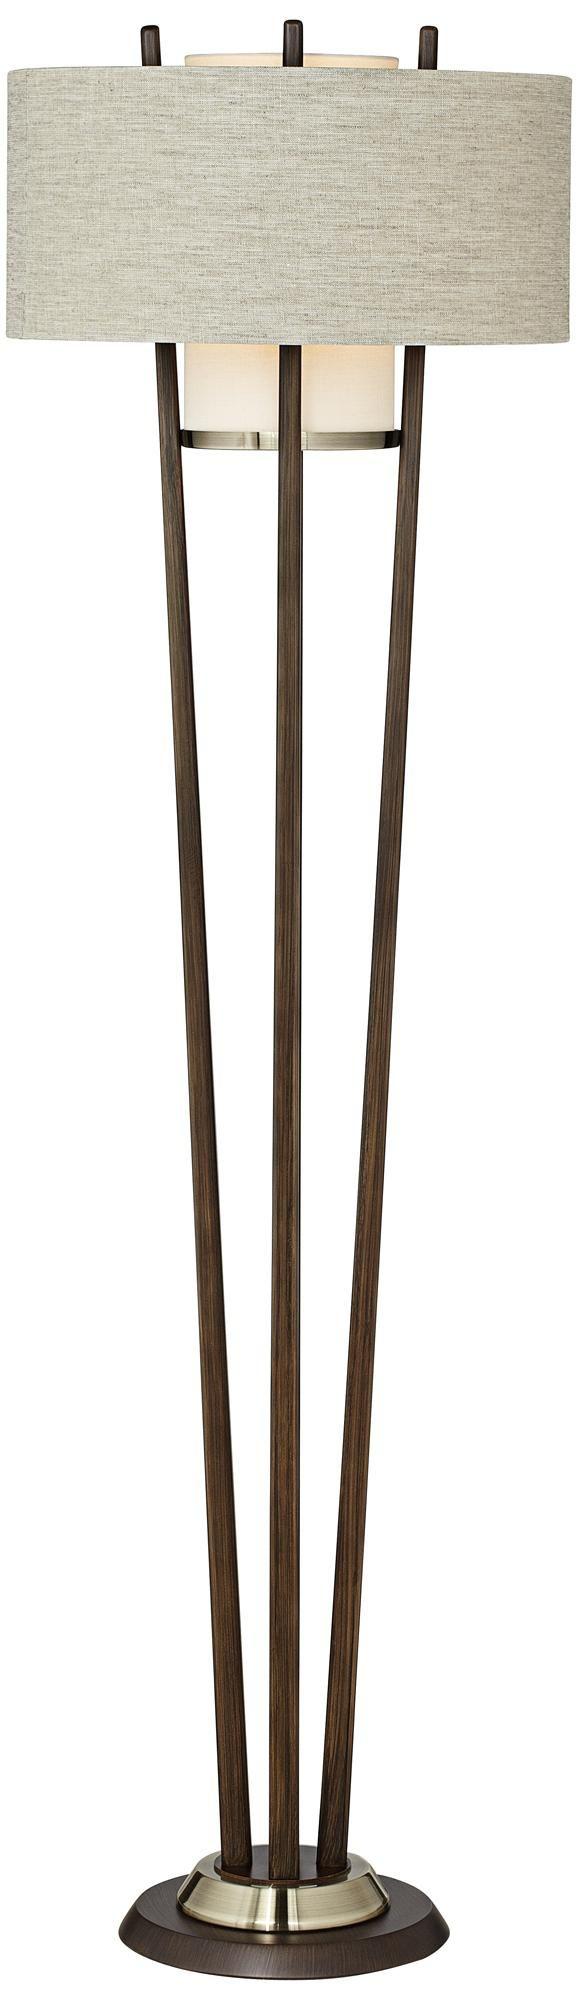 Nova Veld Pecan and Weathered Brass Floor Lamp   LampsPlus.com